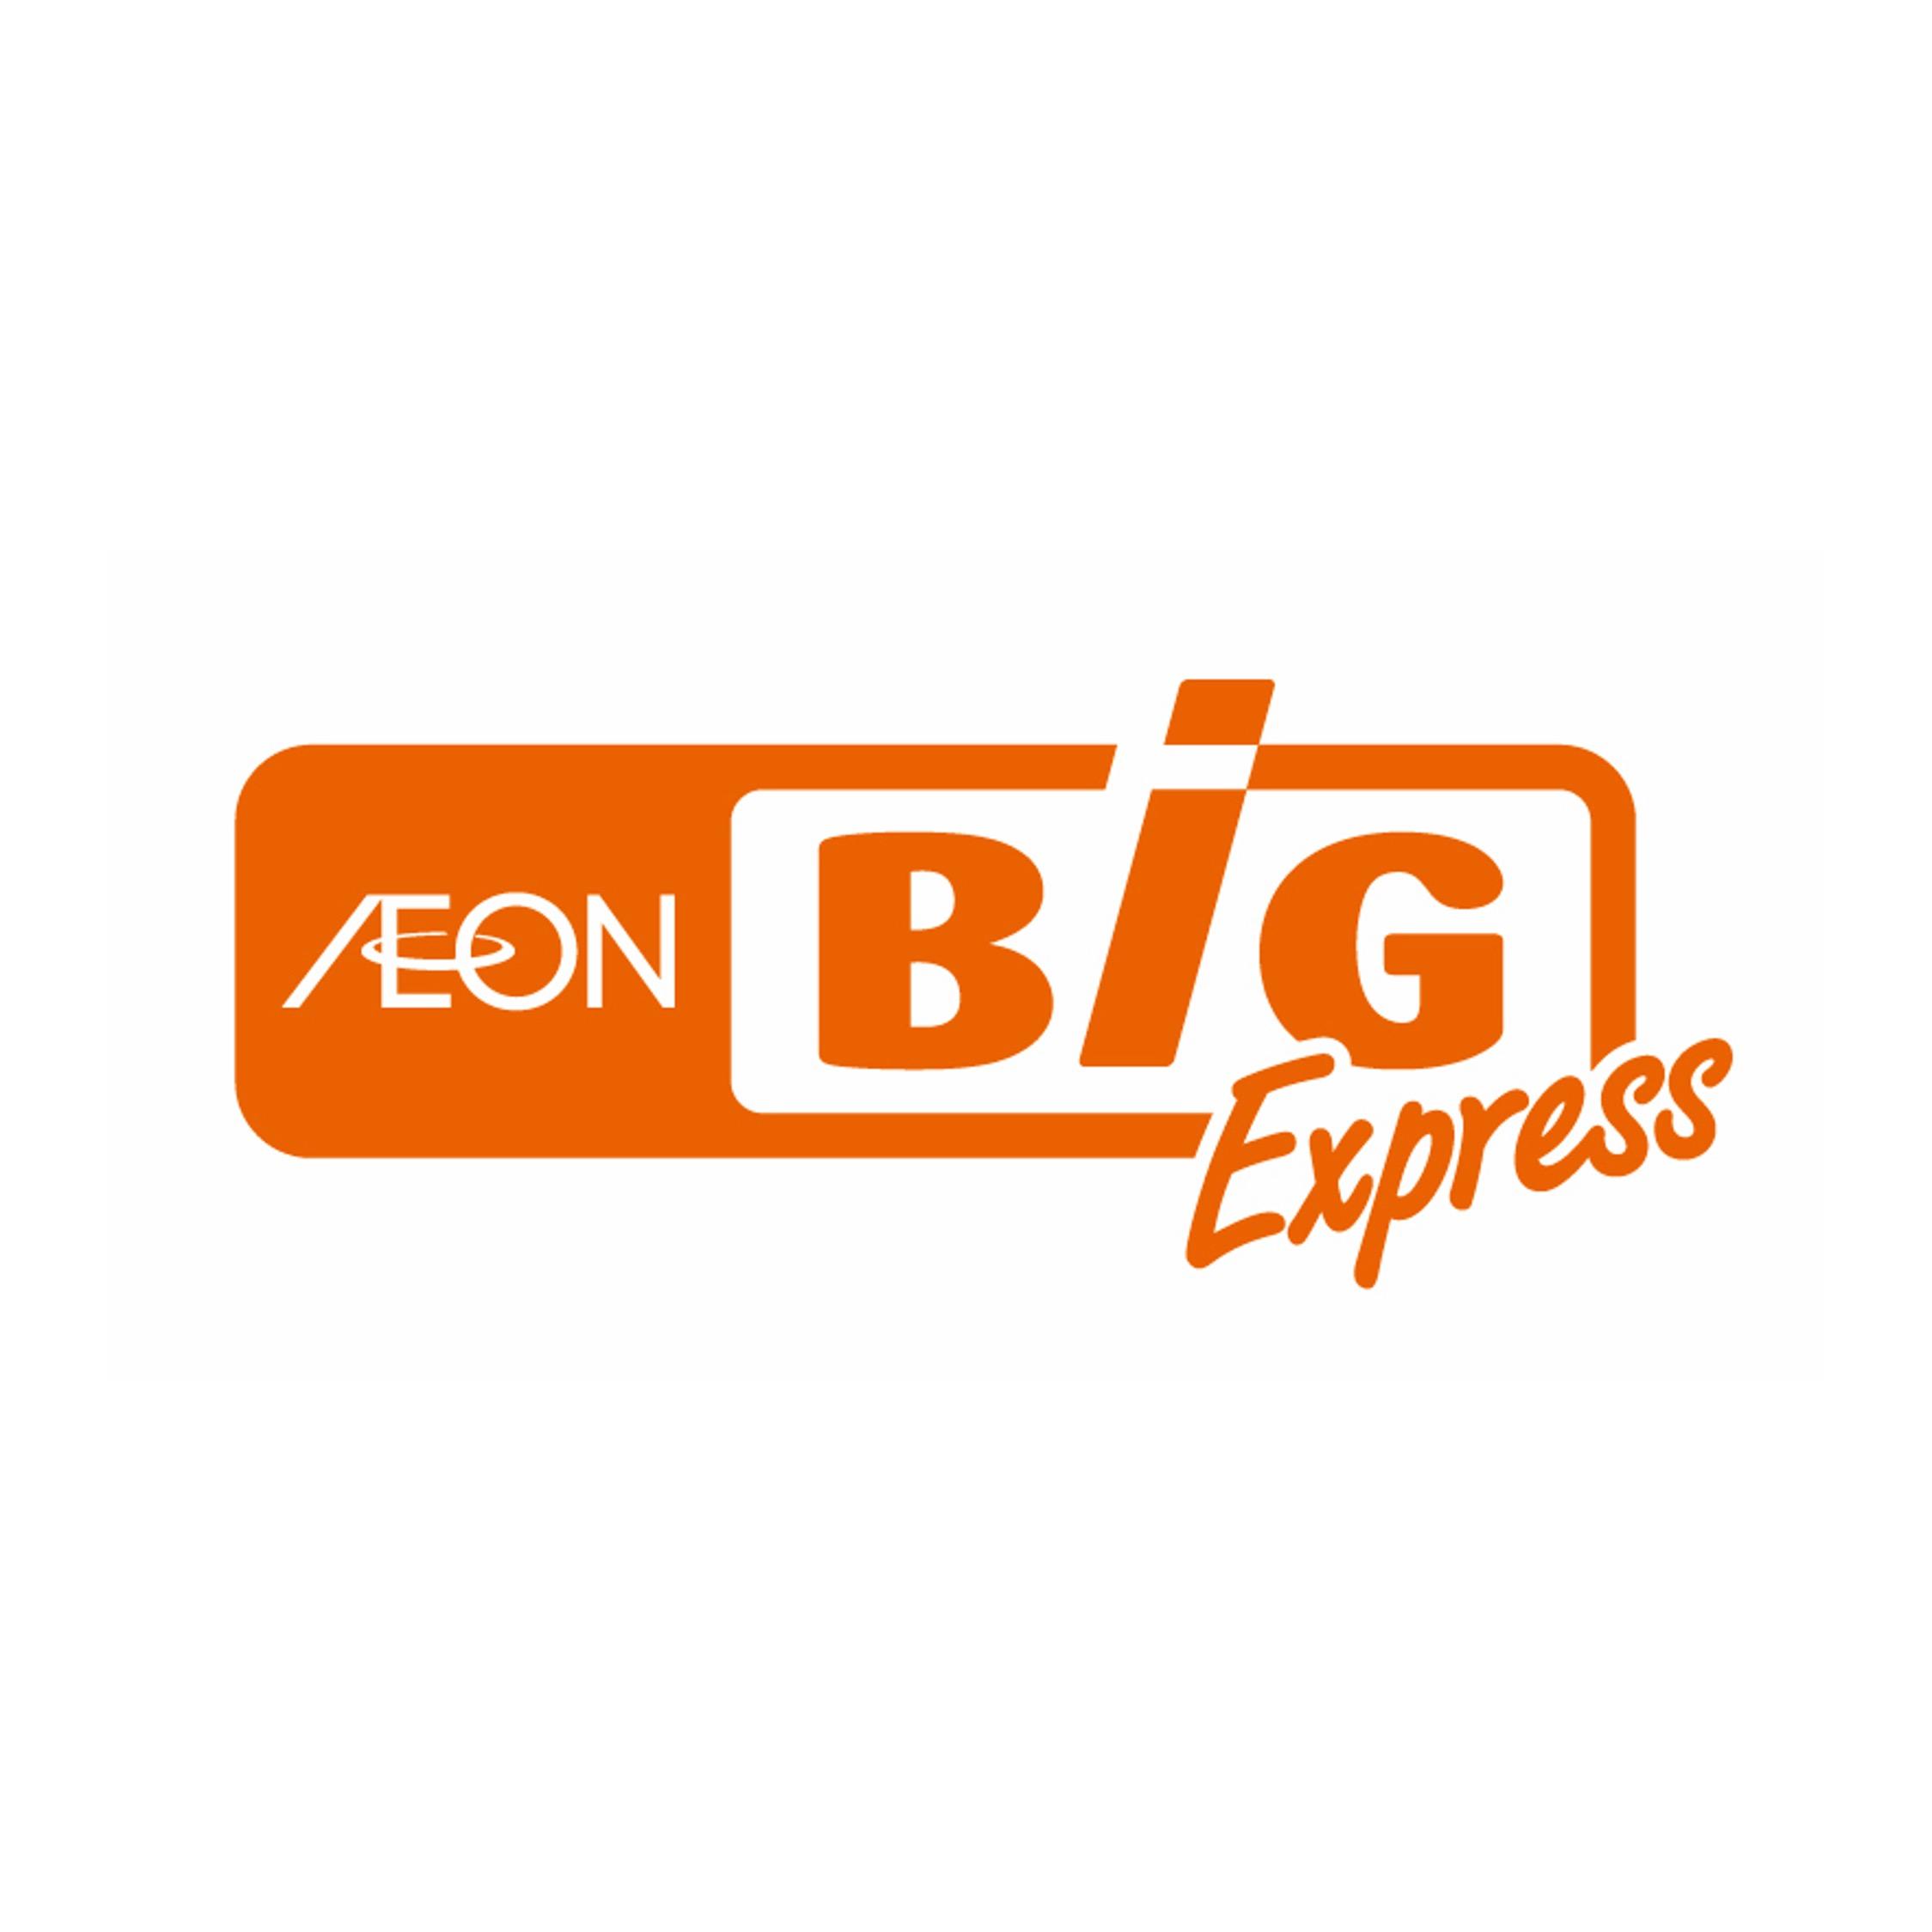 Logo bigexpress